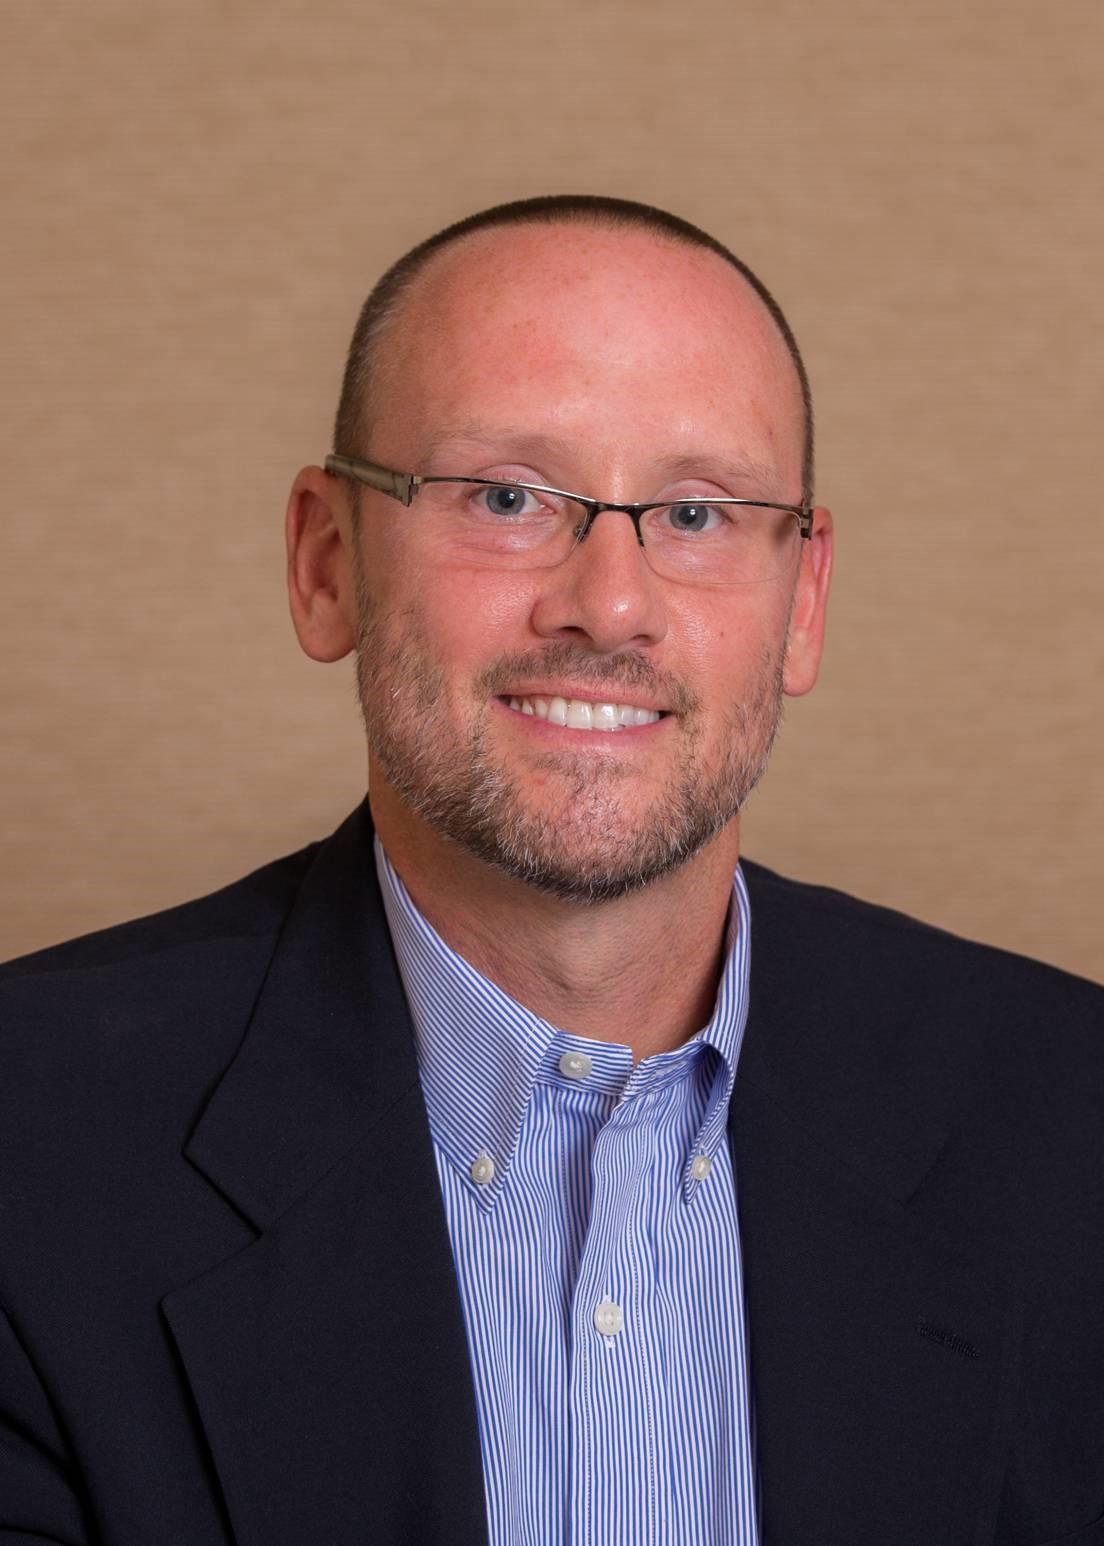 Alan E. Helquist